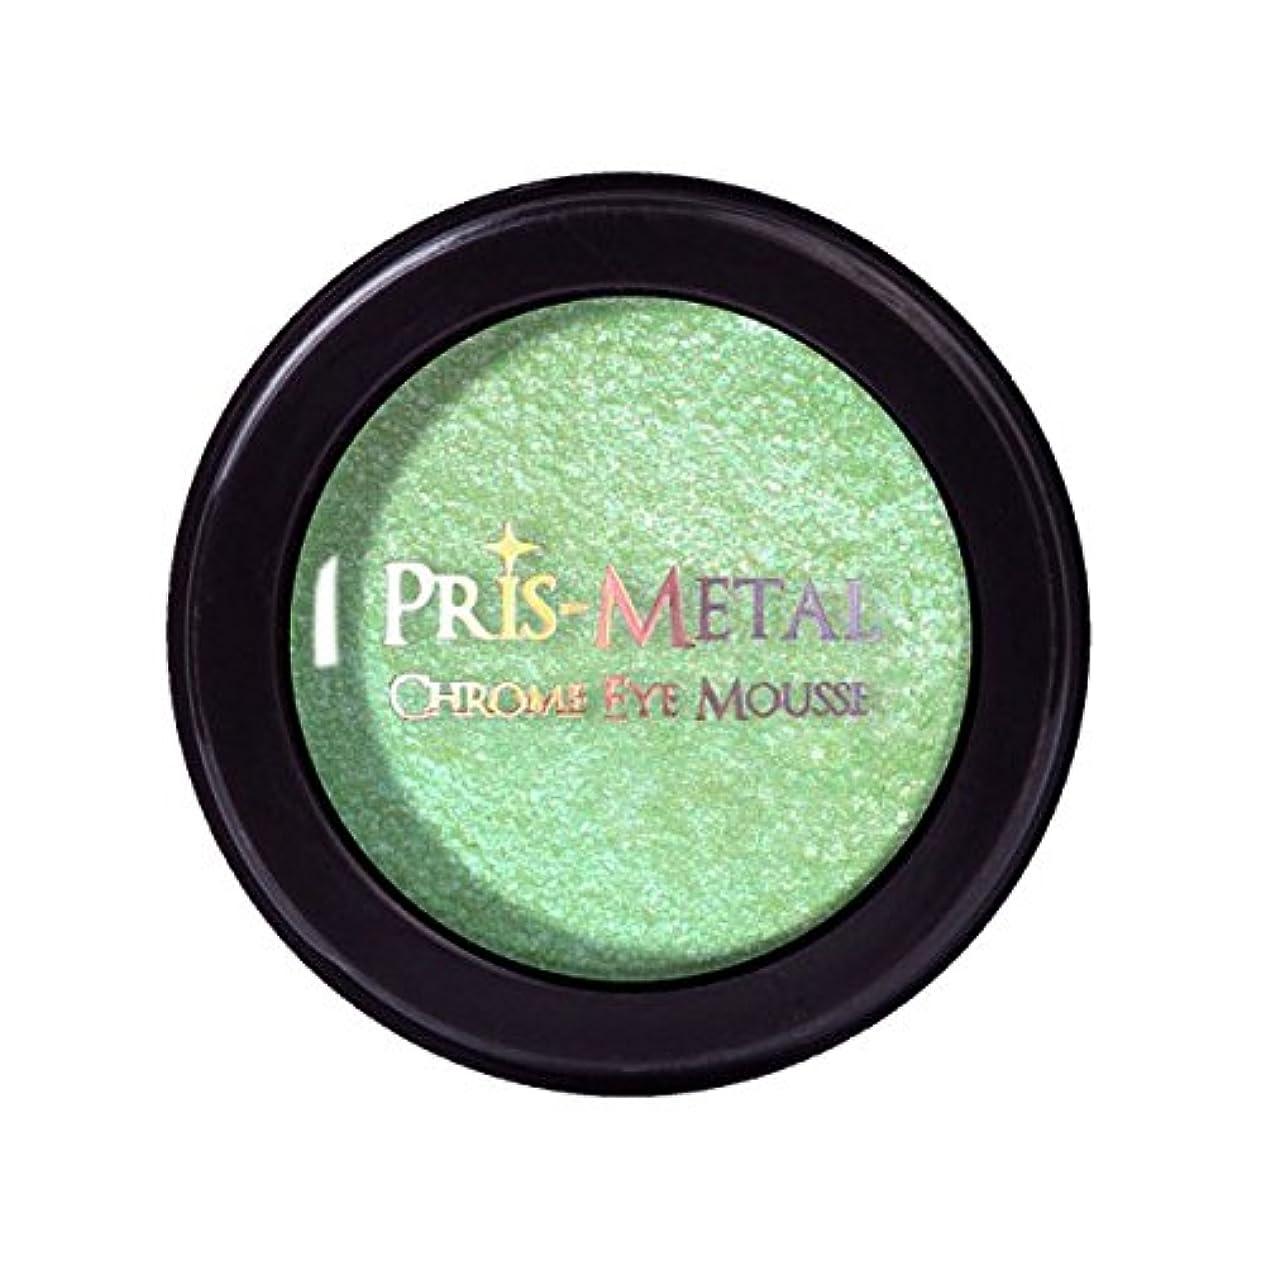 二十段階の頭の上J. CAT BEAUTY Pris-Metal Chrome Eye Mousse - Pixie Dust (並行輸入品)